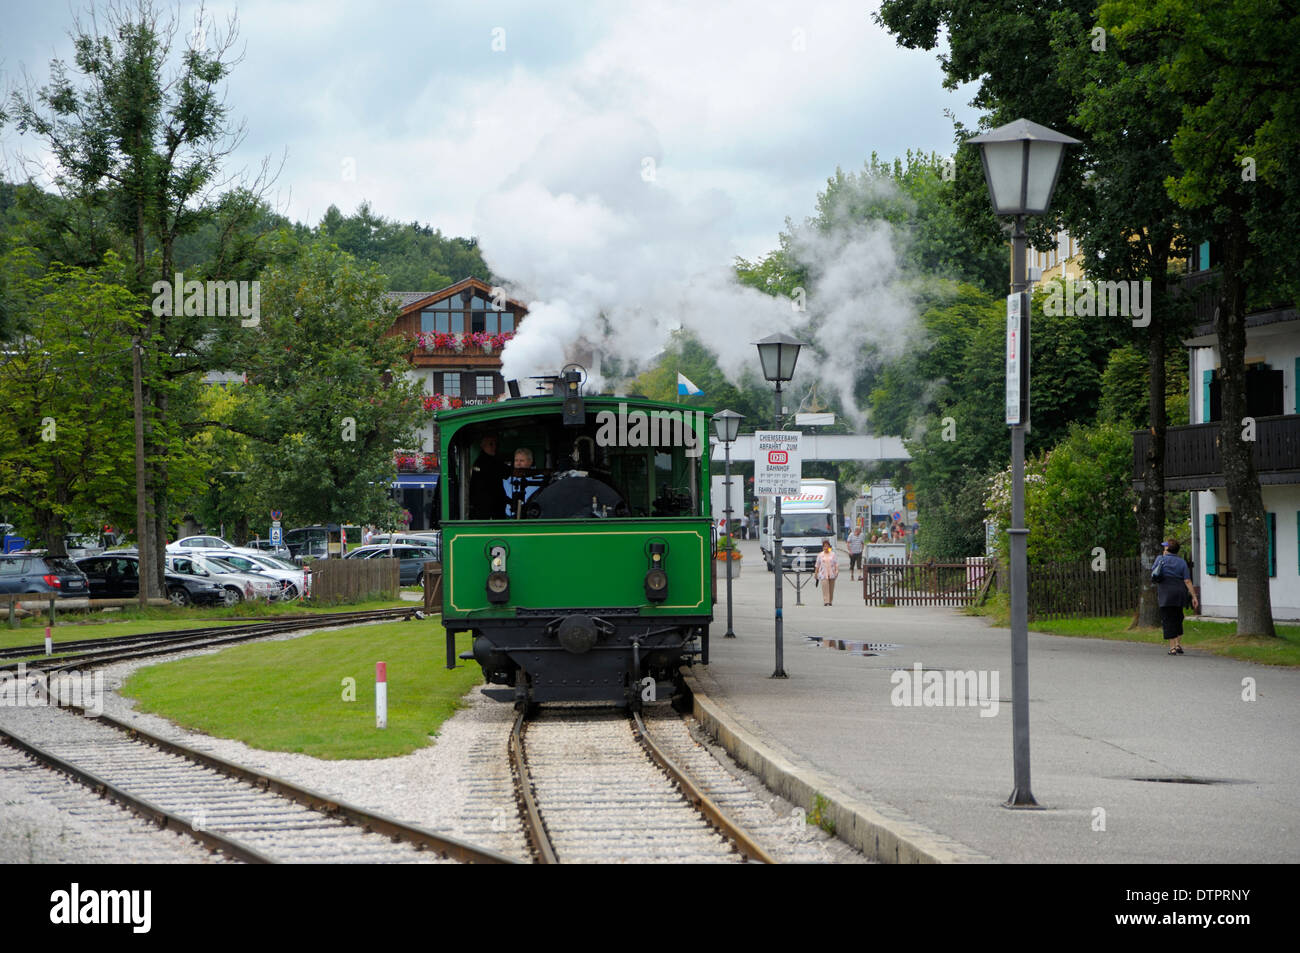 Chiemseebahn, railway in Prien, Chiemsee, Chiemgau, Bavaria, Germany Stock Photo